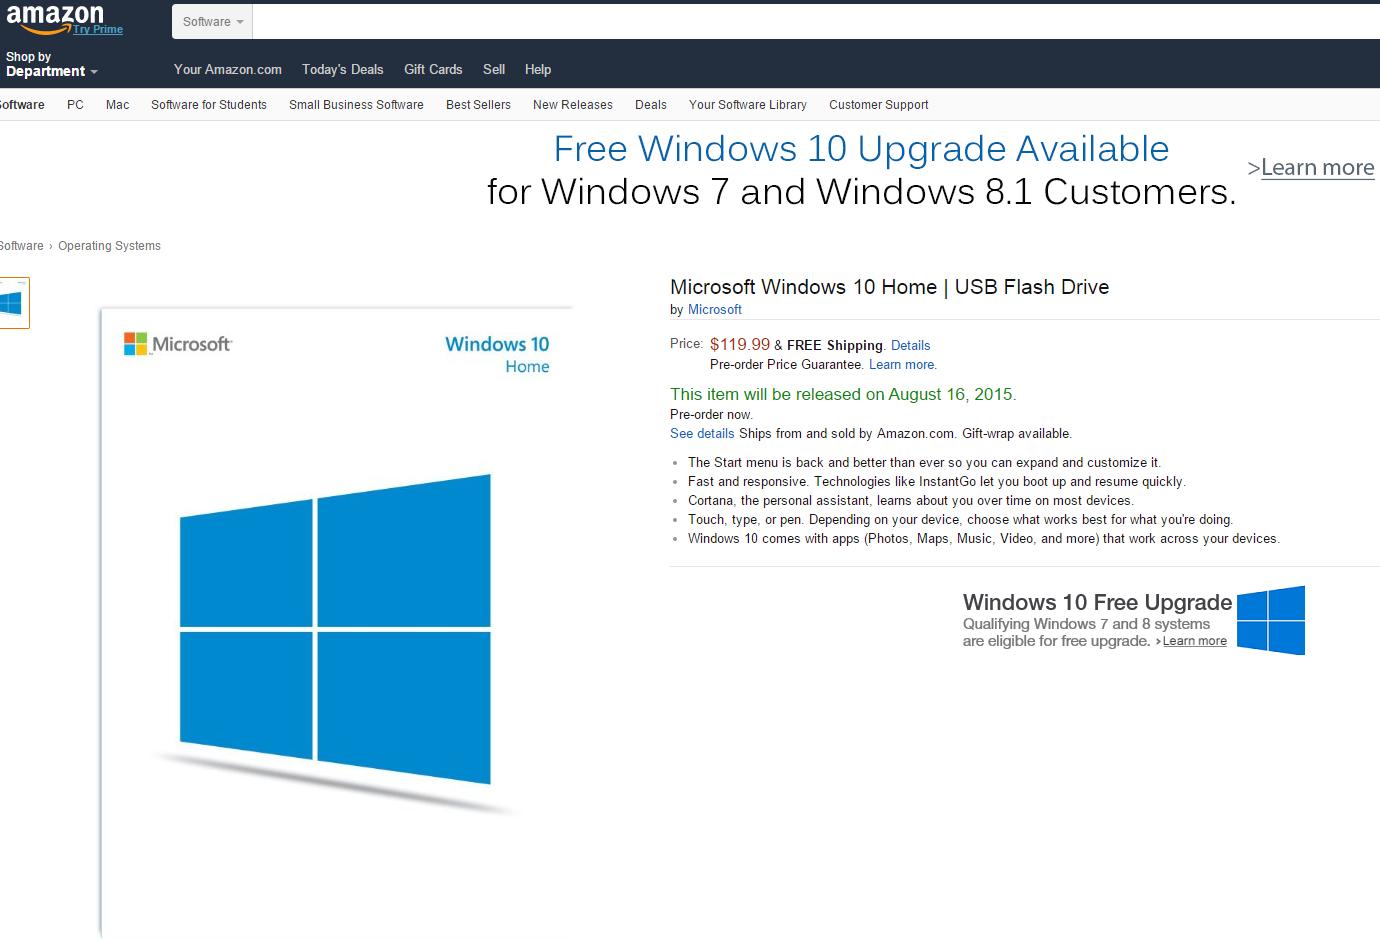 Microsoft Windows 10 Home English Usb Flash Drive: Microsoft Confirms Plans To Sell Windows 10 On USB Drives